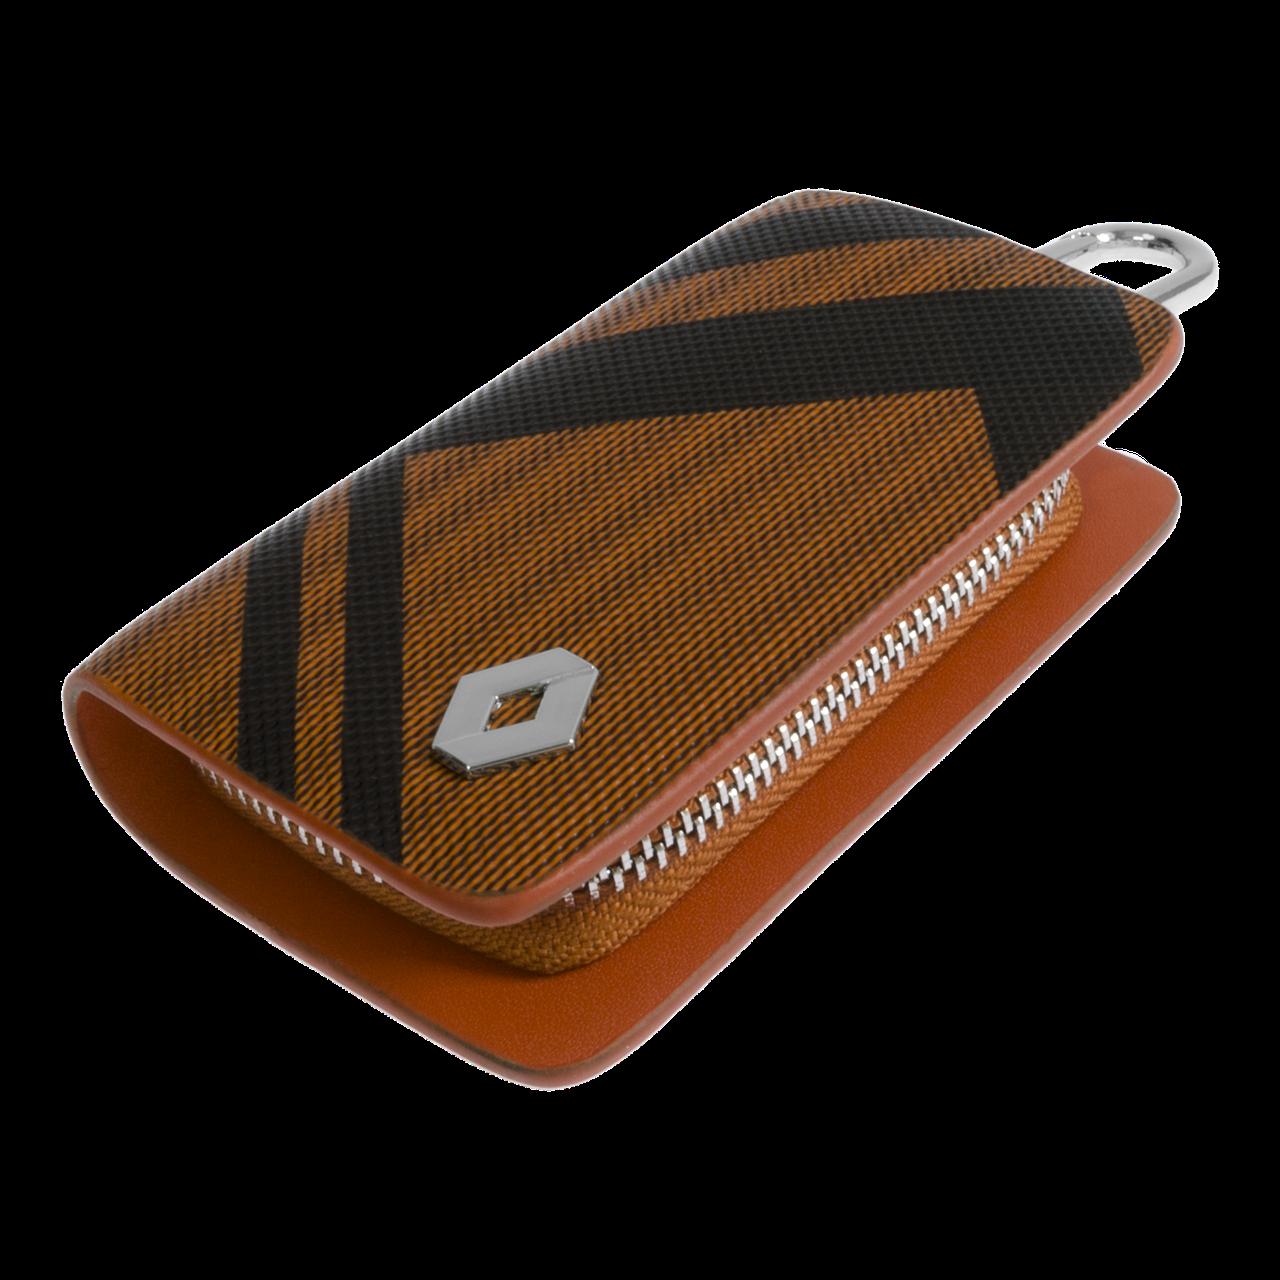 Ключница Carss с логотипом RENAULT 20014 карбон коричневый